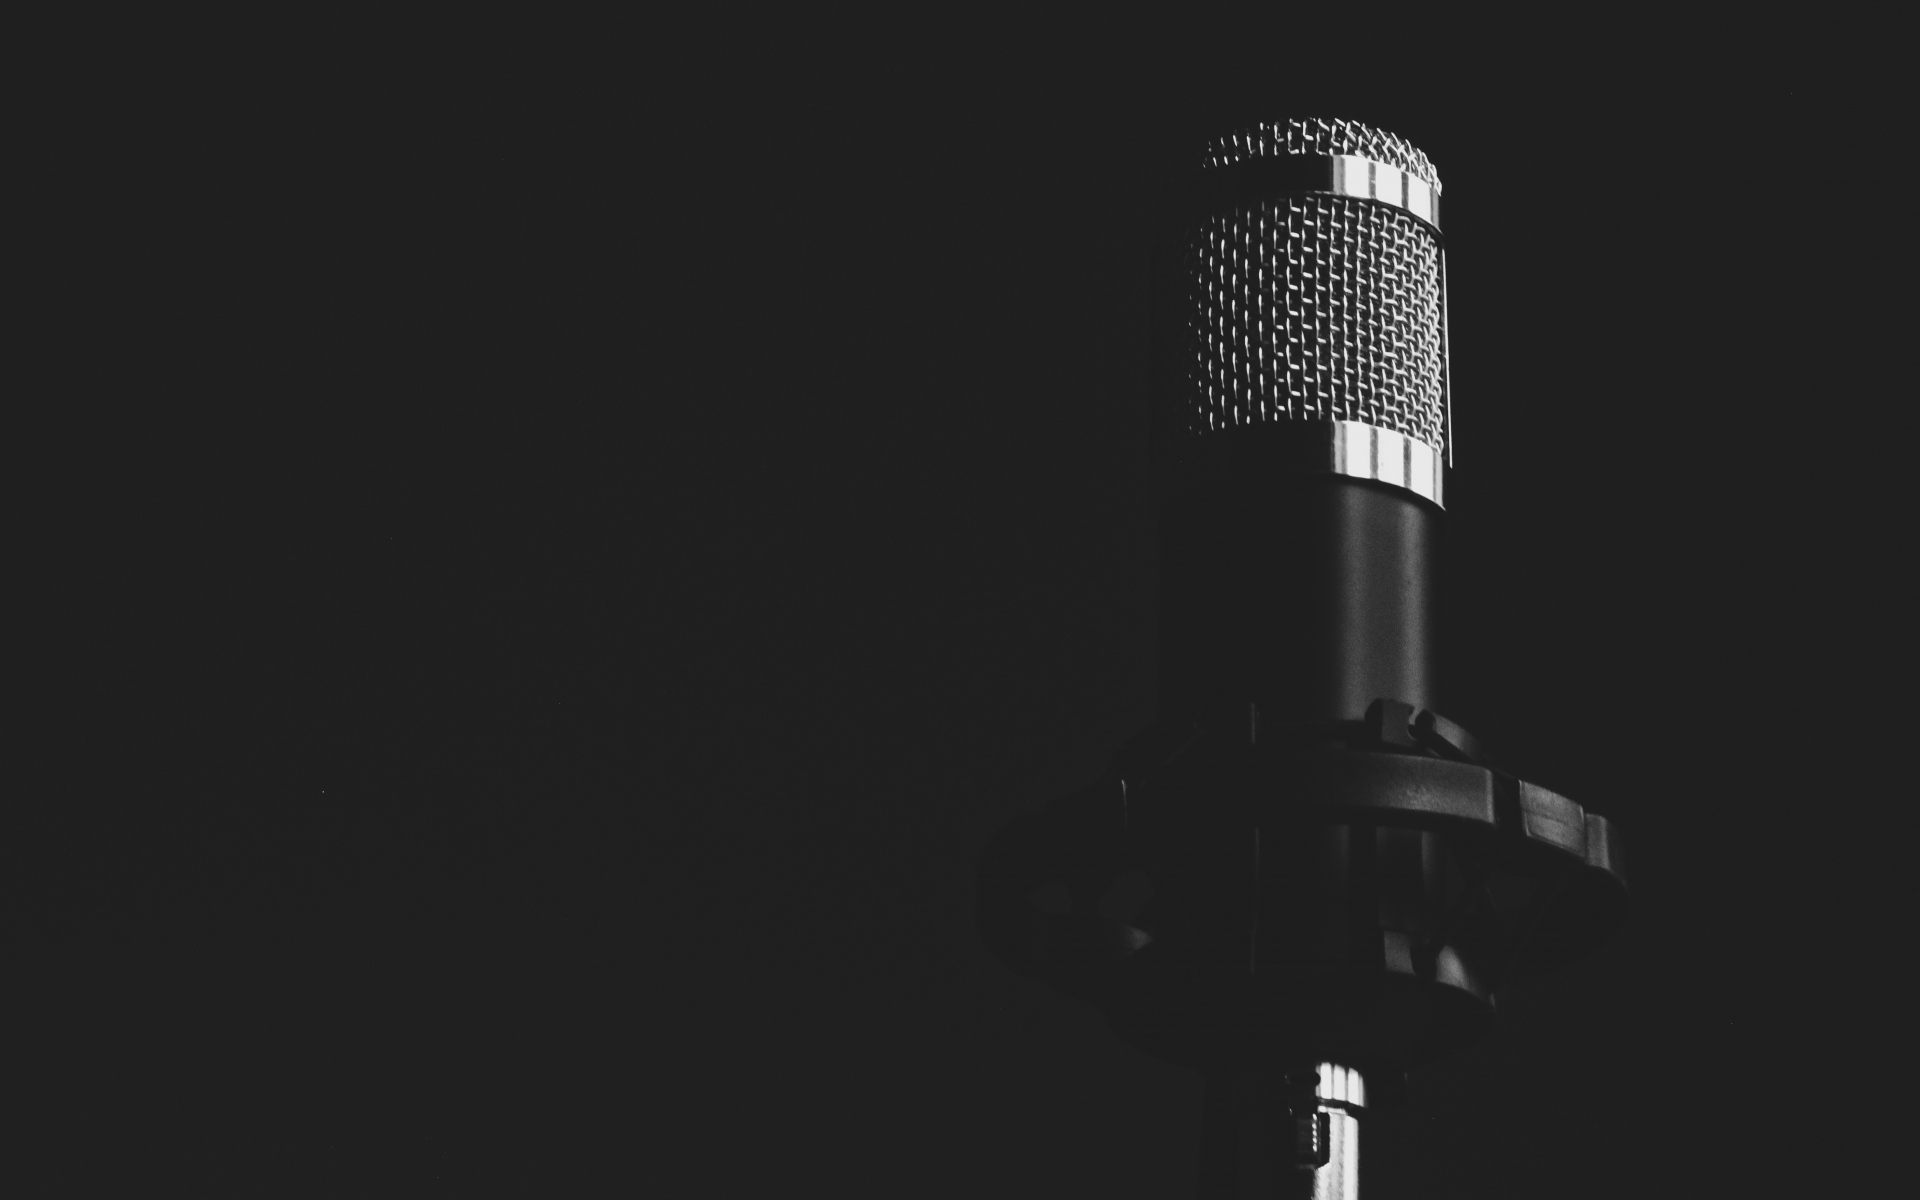 Картинки Микрофон, музыка, bw фото и обои на рабочий стол